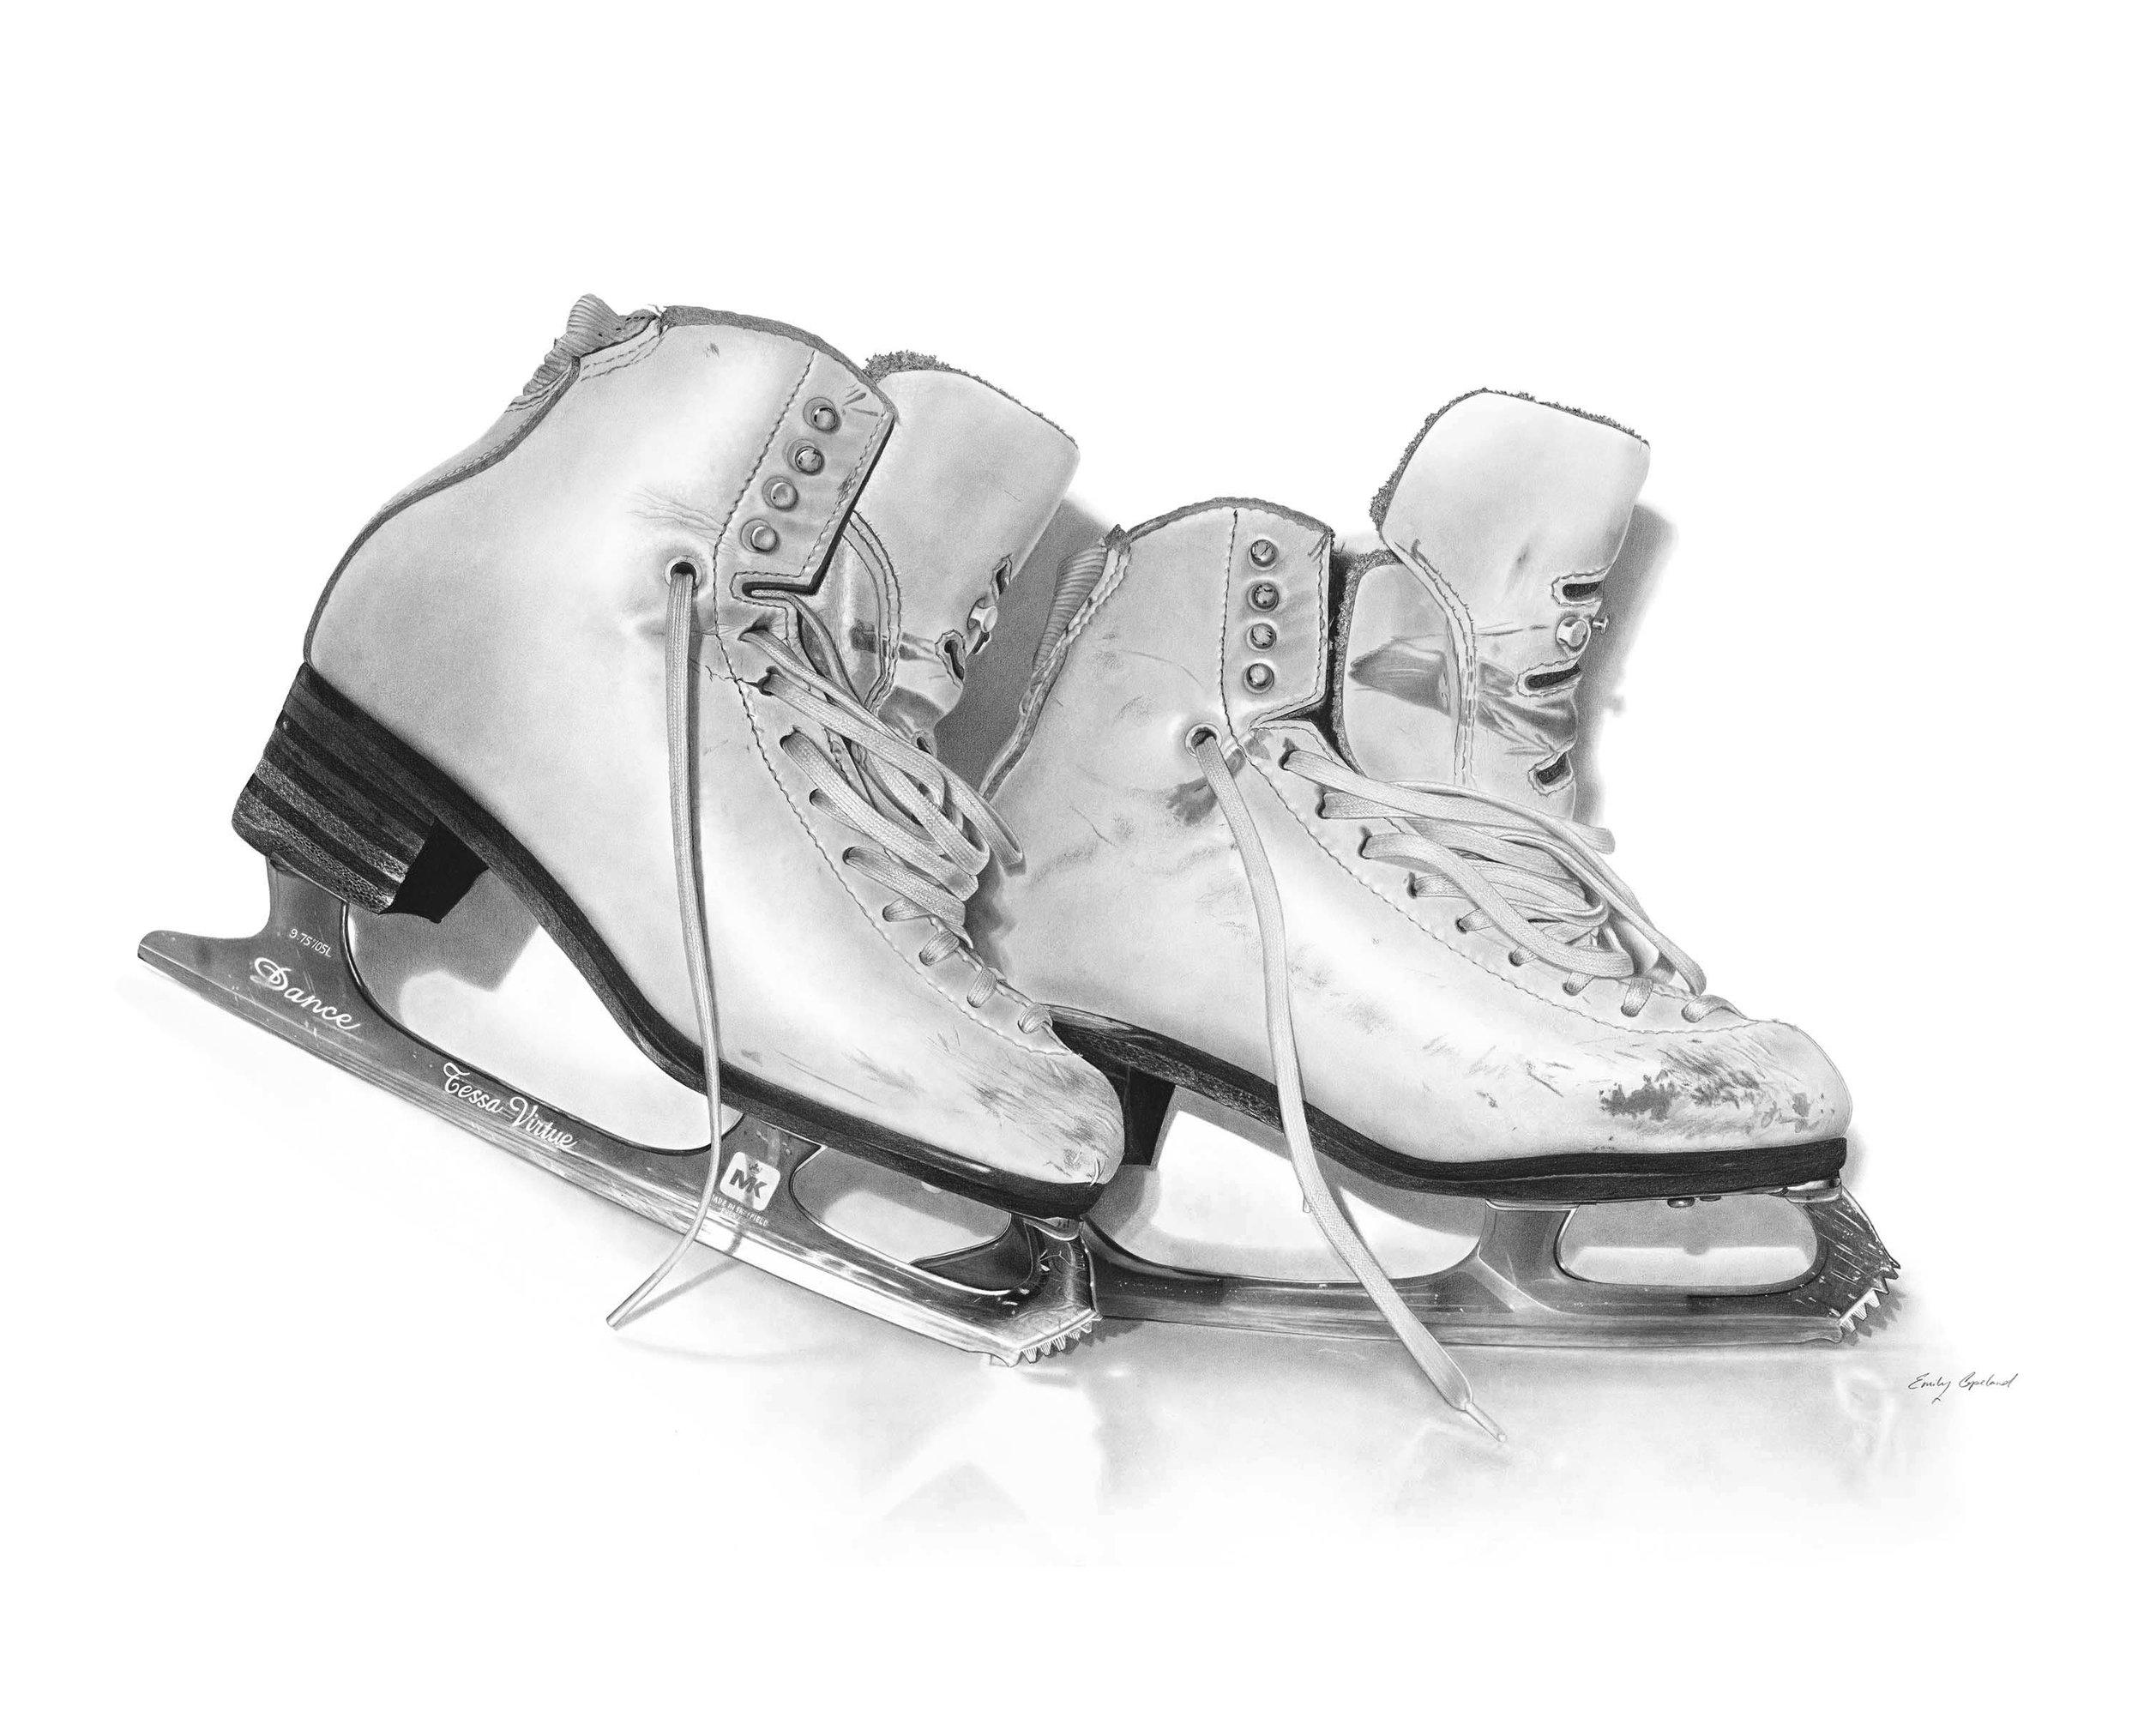 Tessa Virtue's Olympic Skates